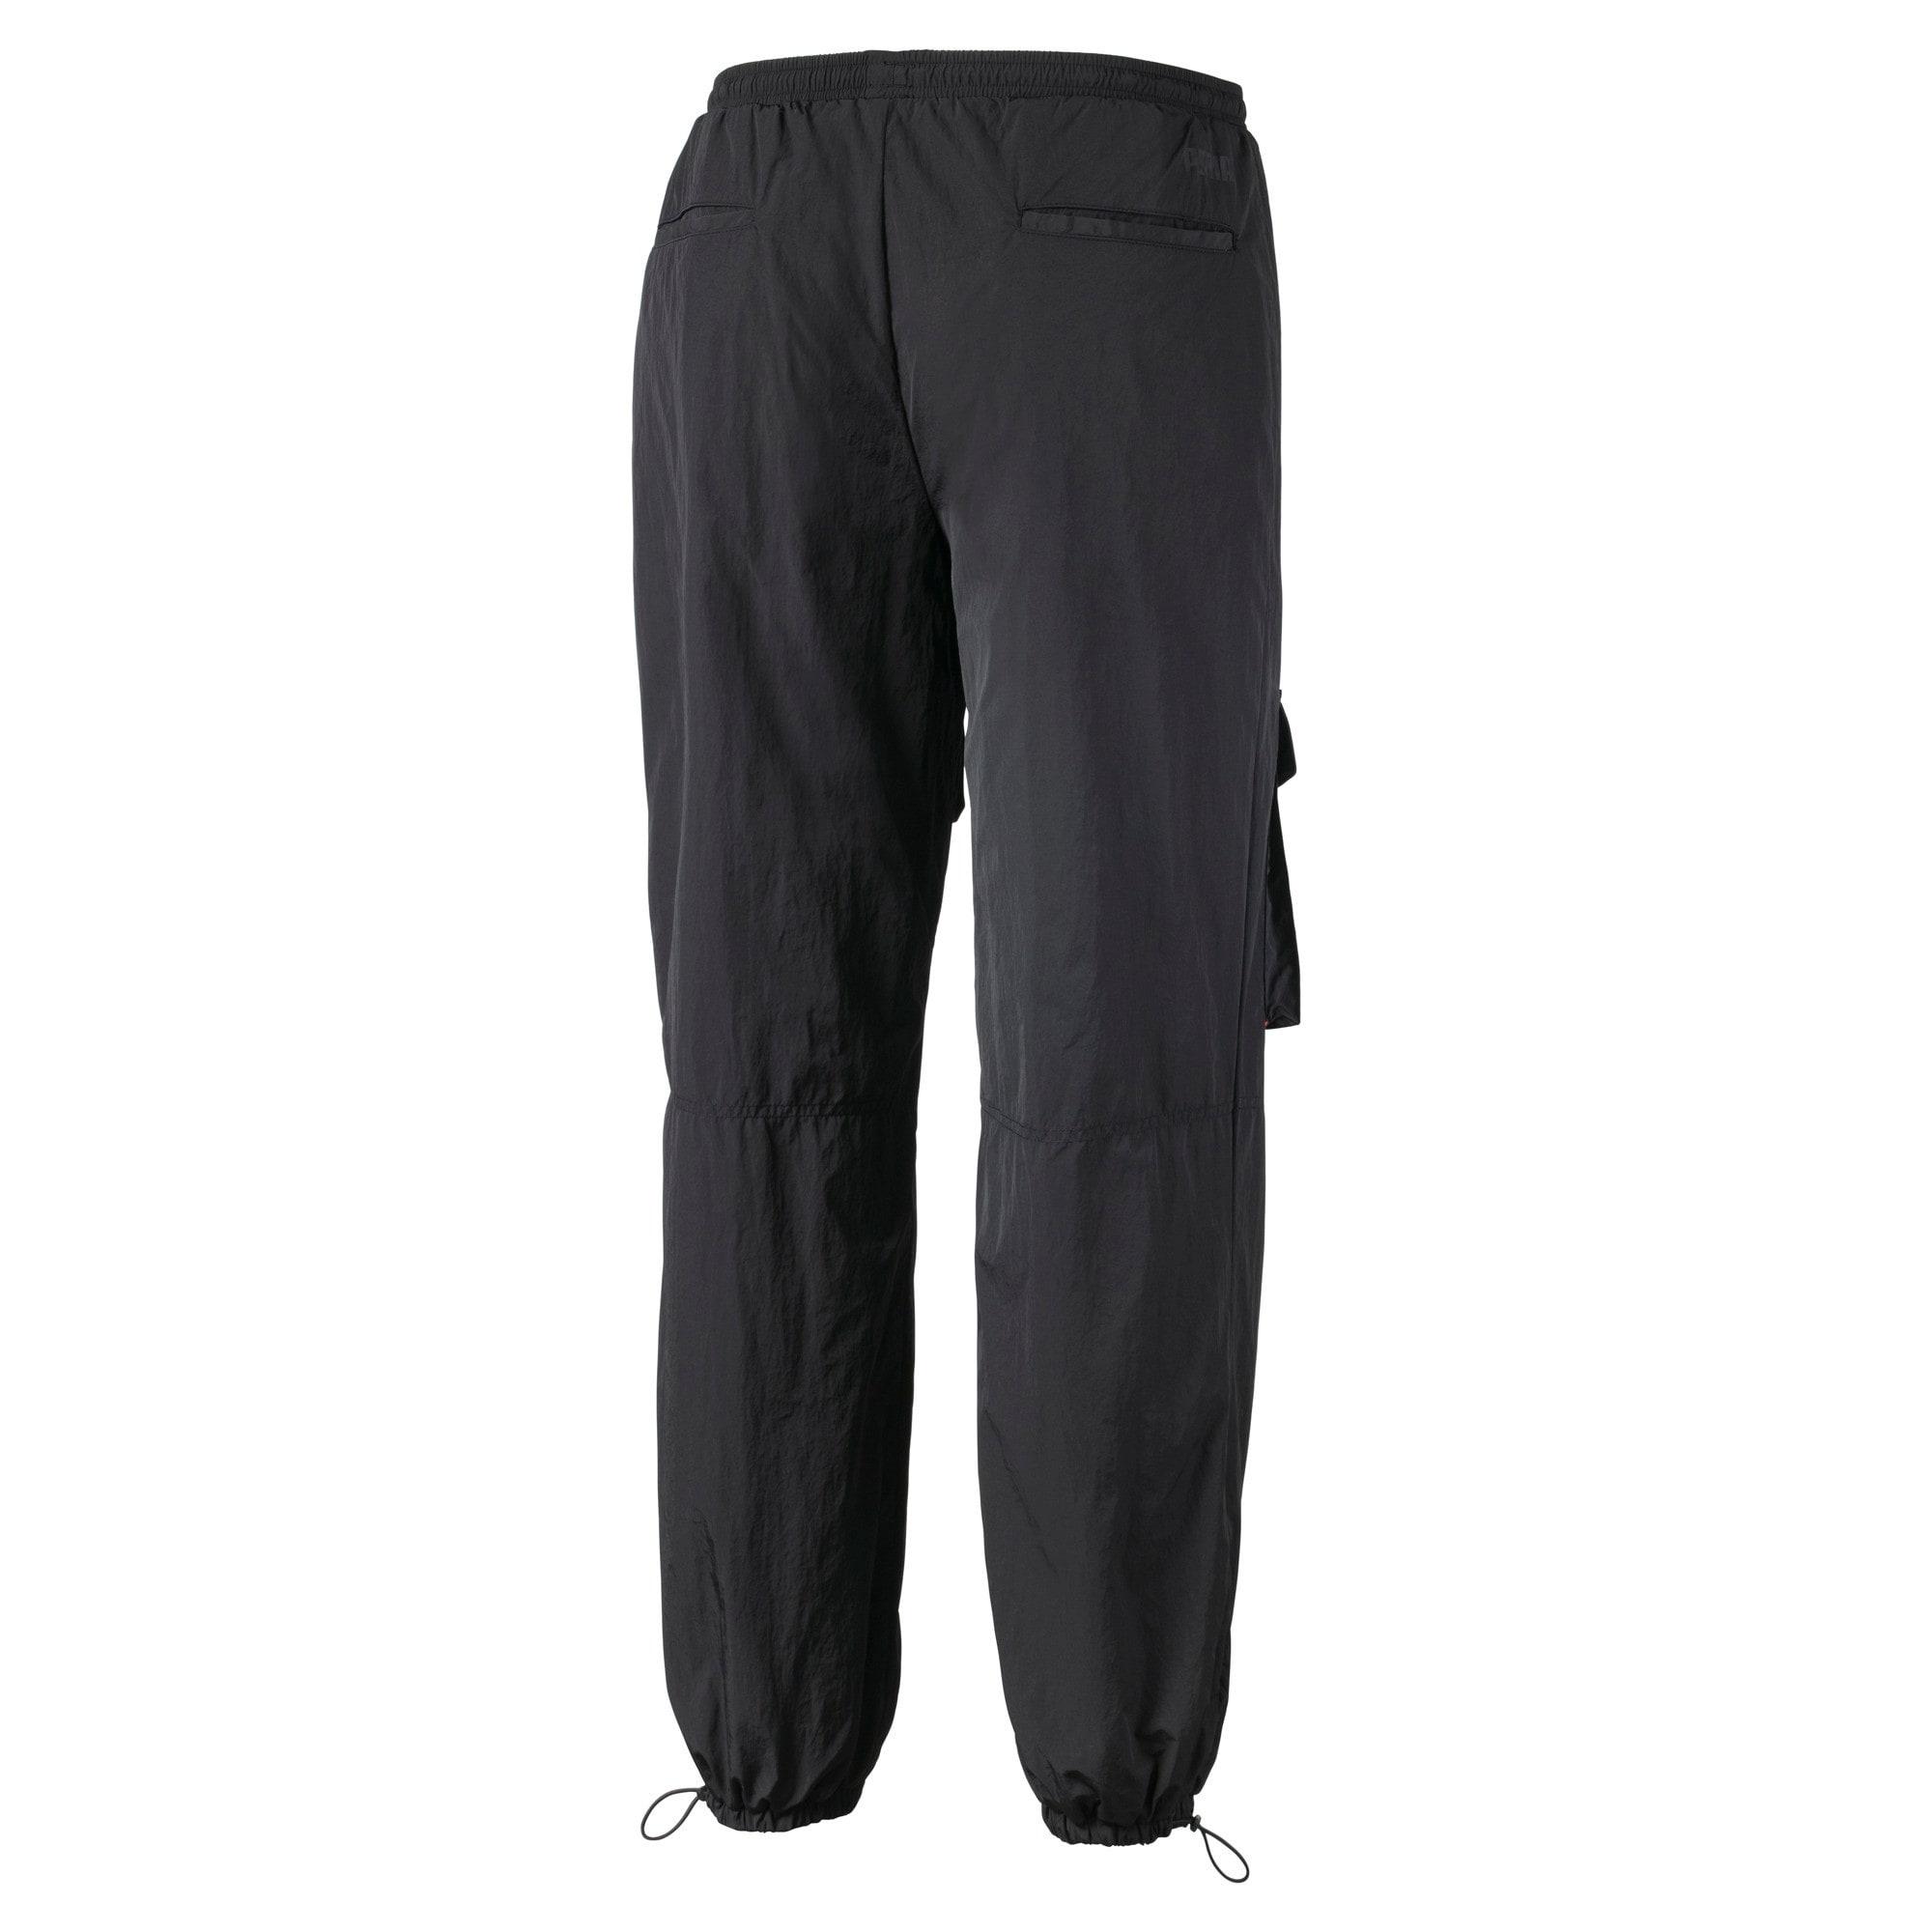 Thumbnail 2 of Alteration Men's Pants, Puma Black, medium